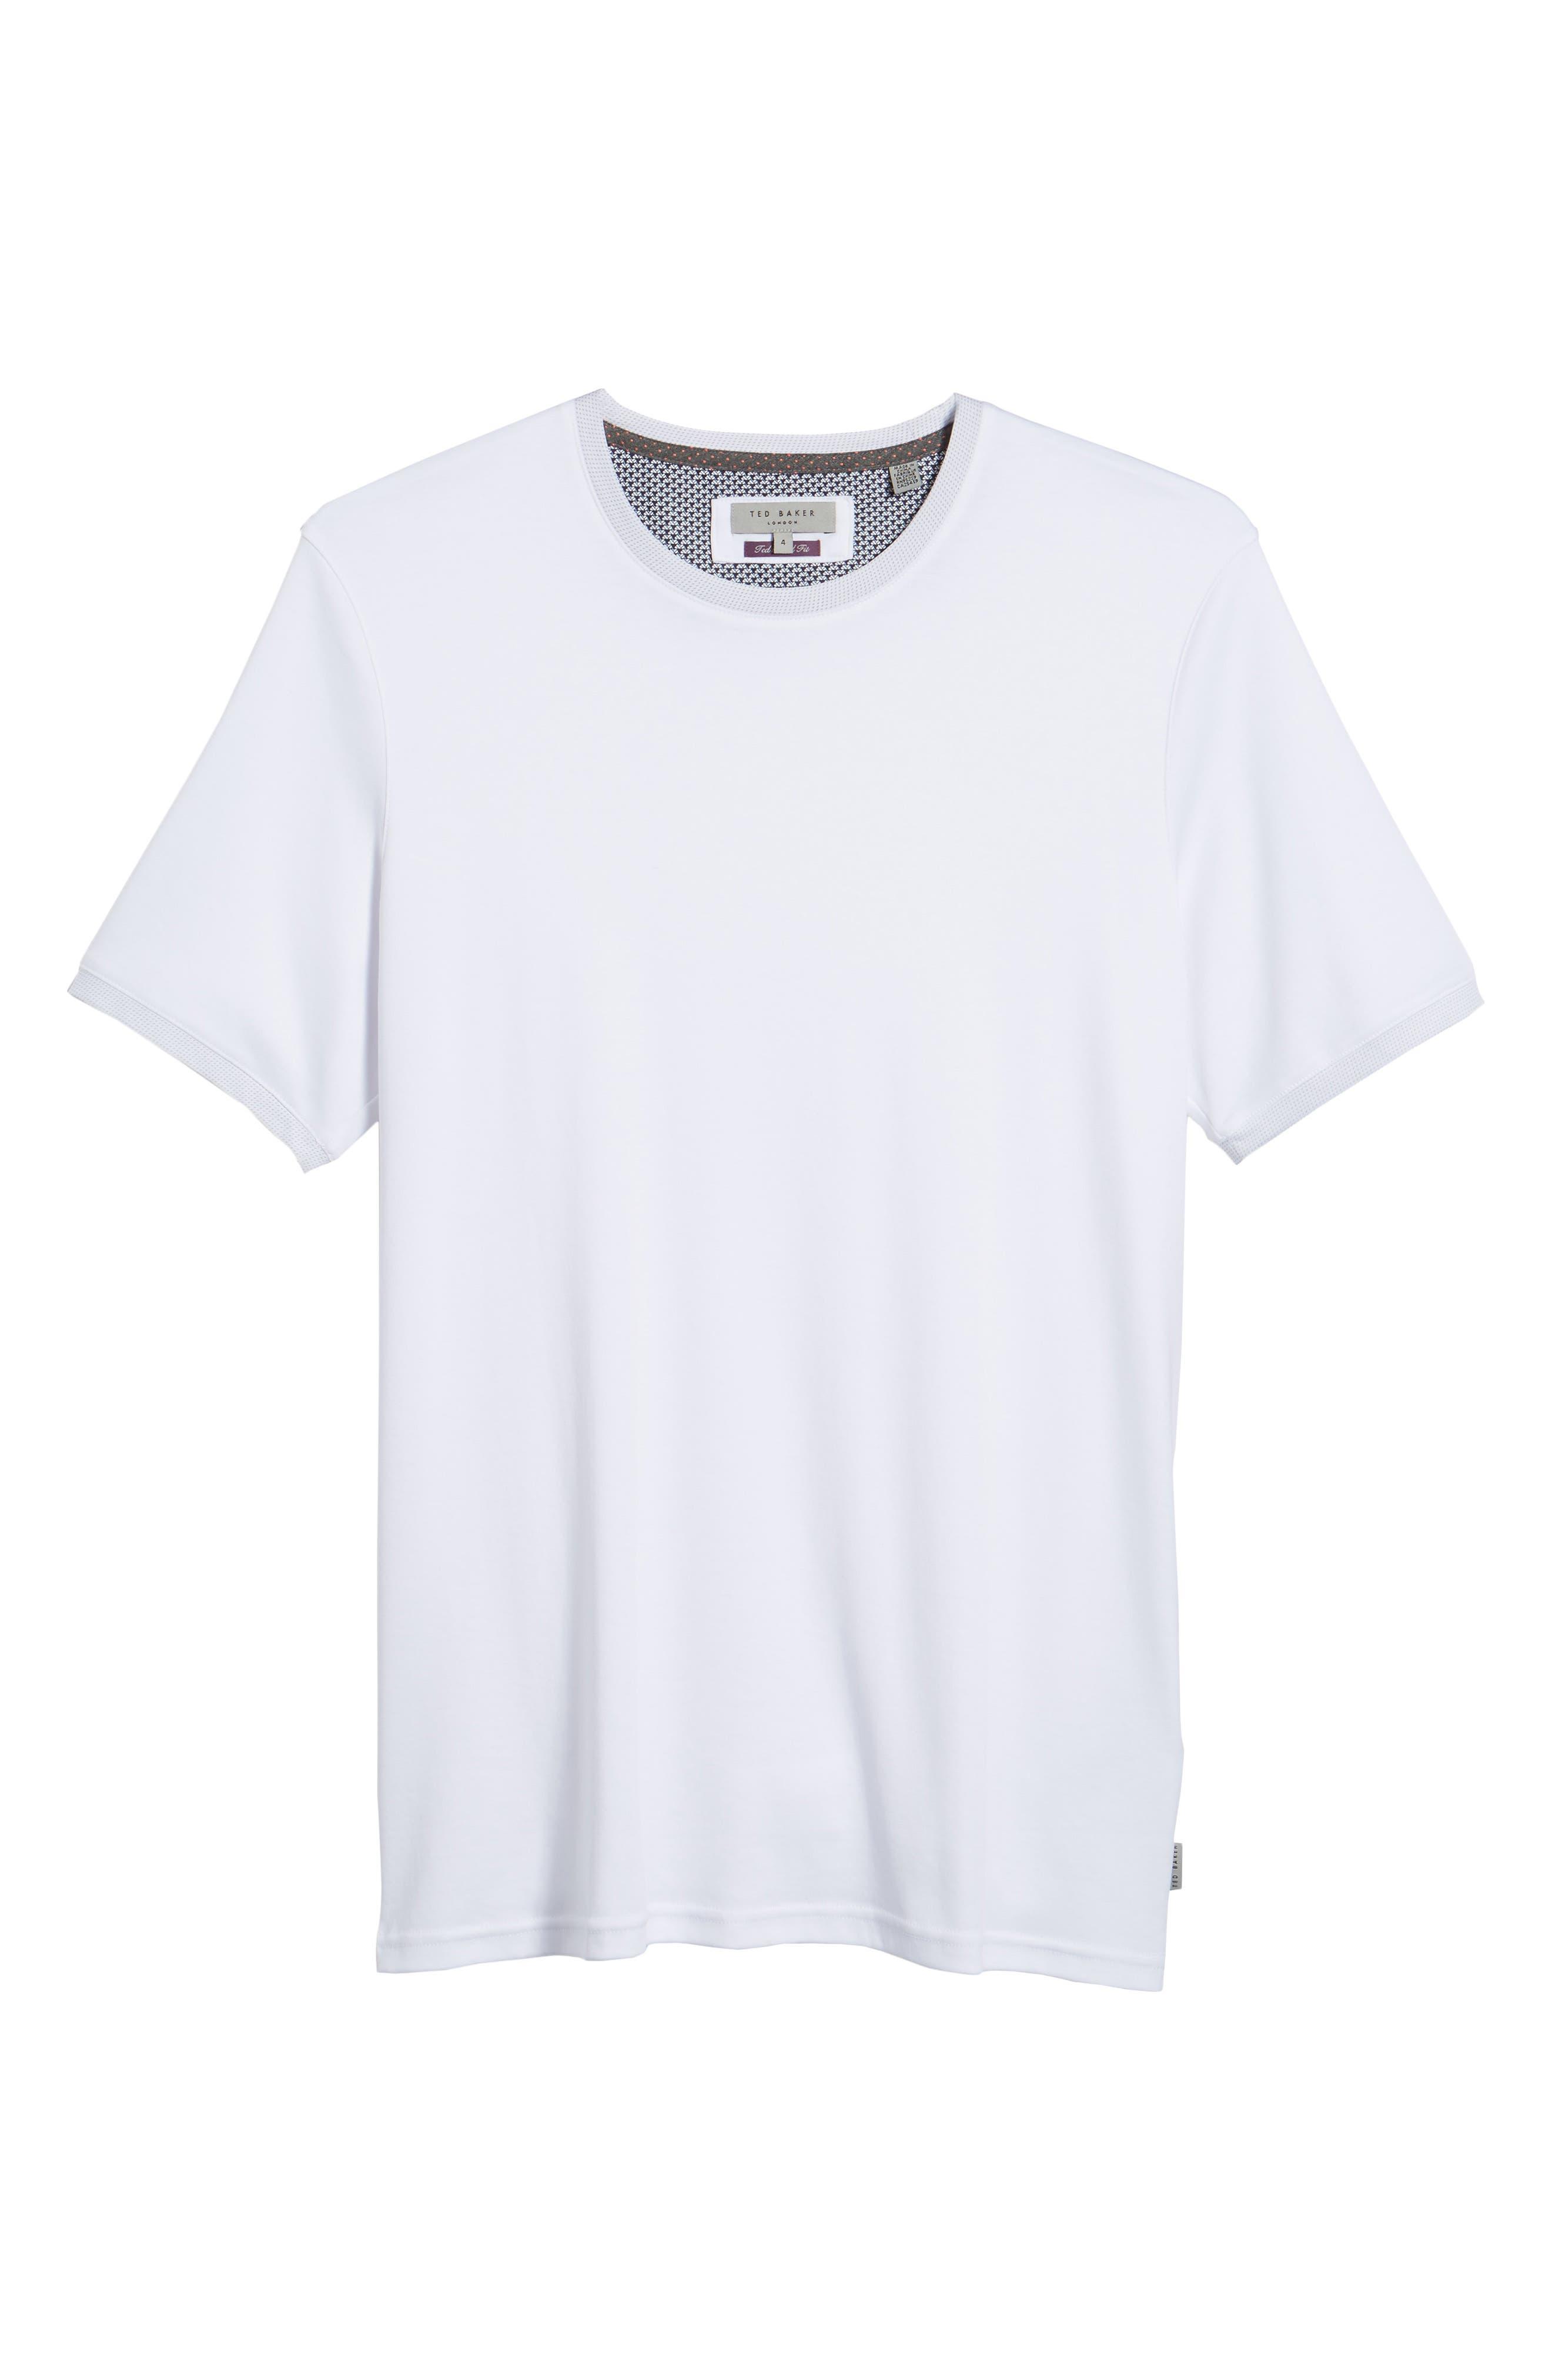 Piktt Crewneck T-Shirt,                             Alternate thumbnail 21, color,